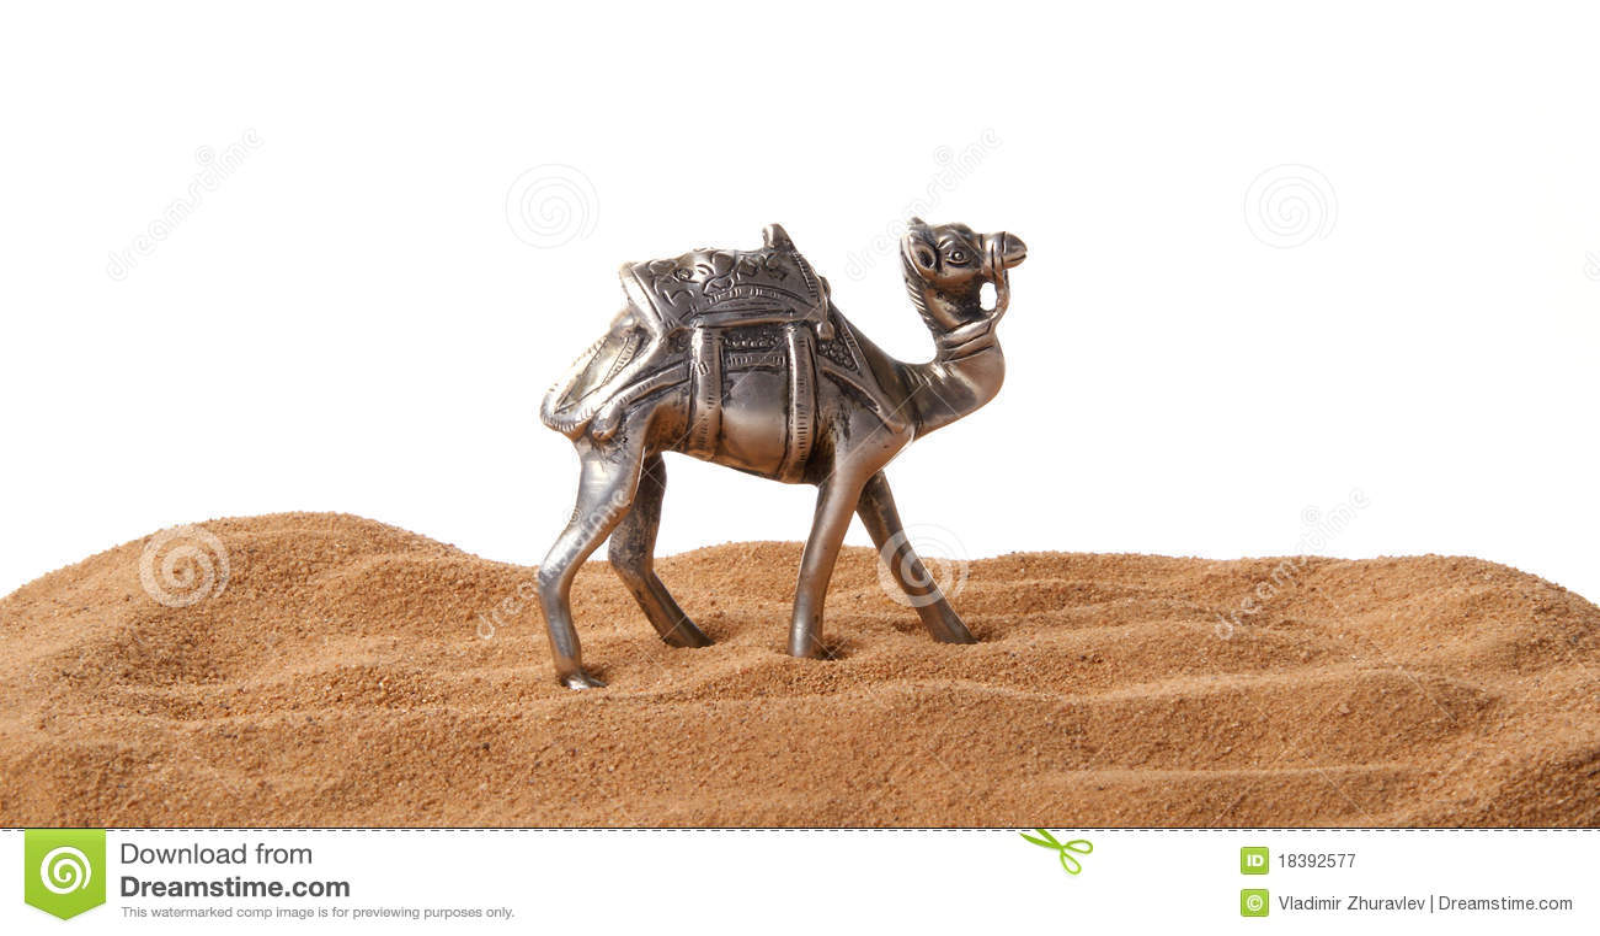 Figurine верблюда сделал сувенир металла